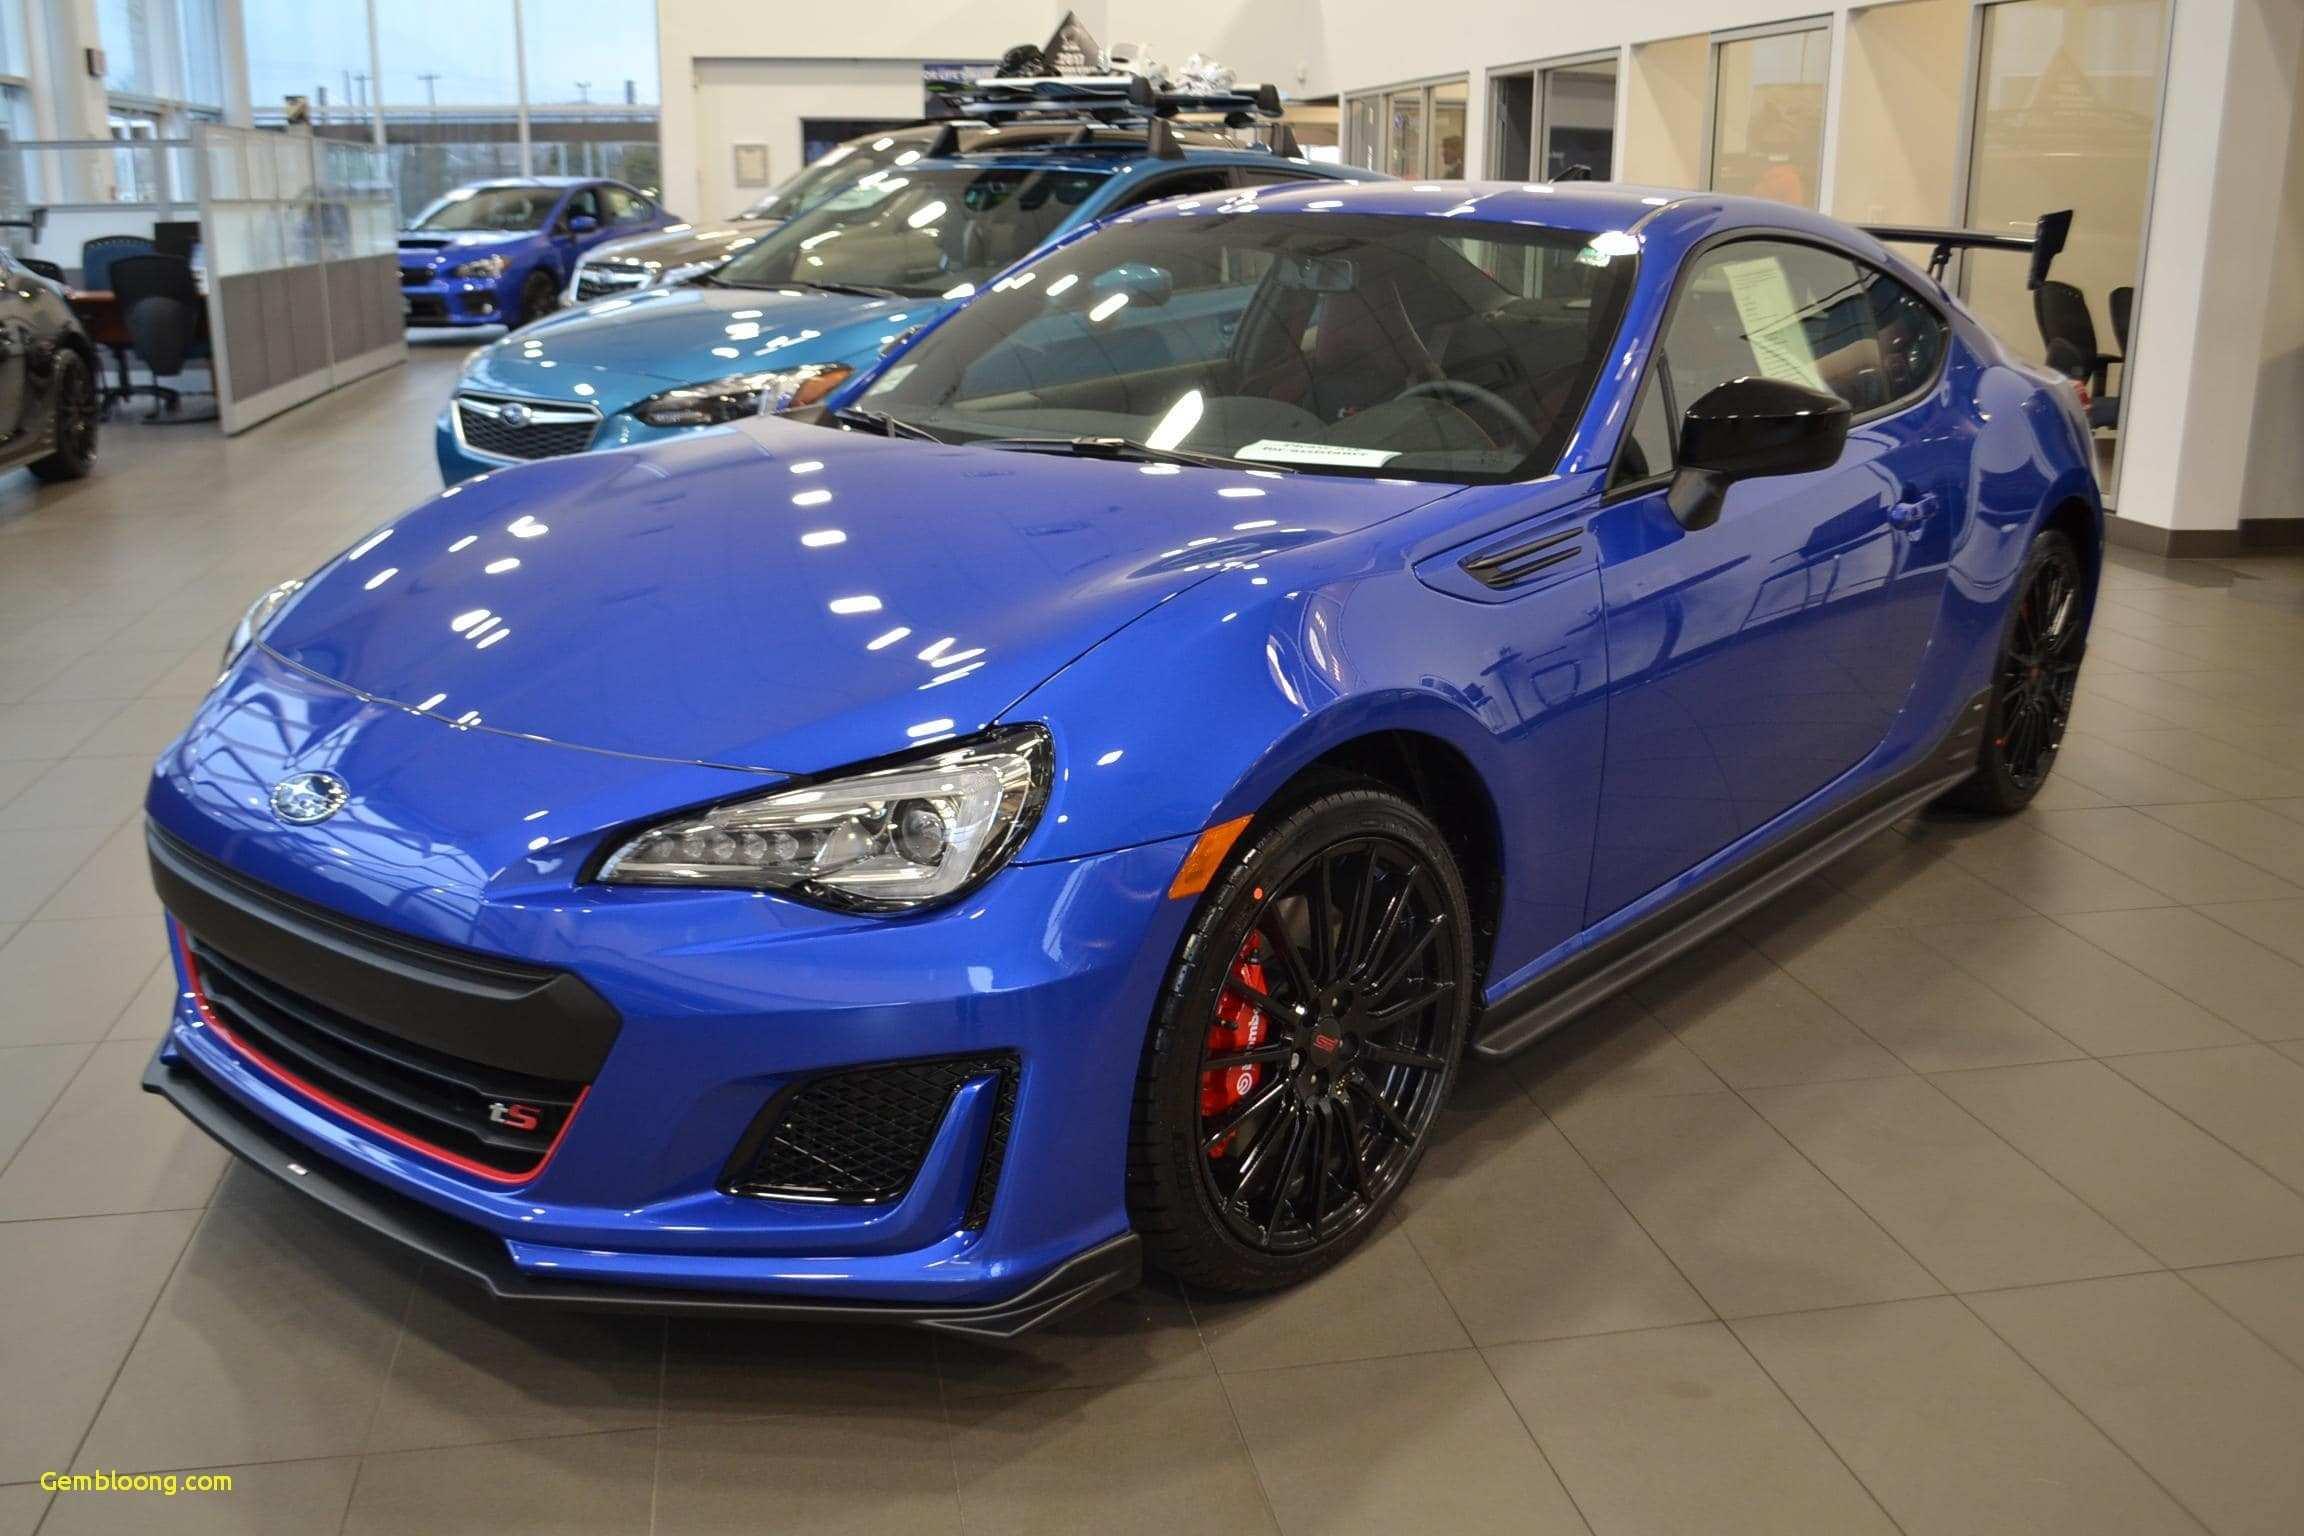 90 Great 2019 Subaru Brz Sti Pricing with 2019 Subaru Brz Sti